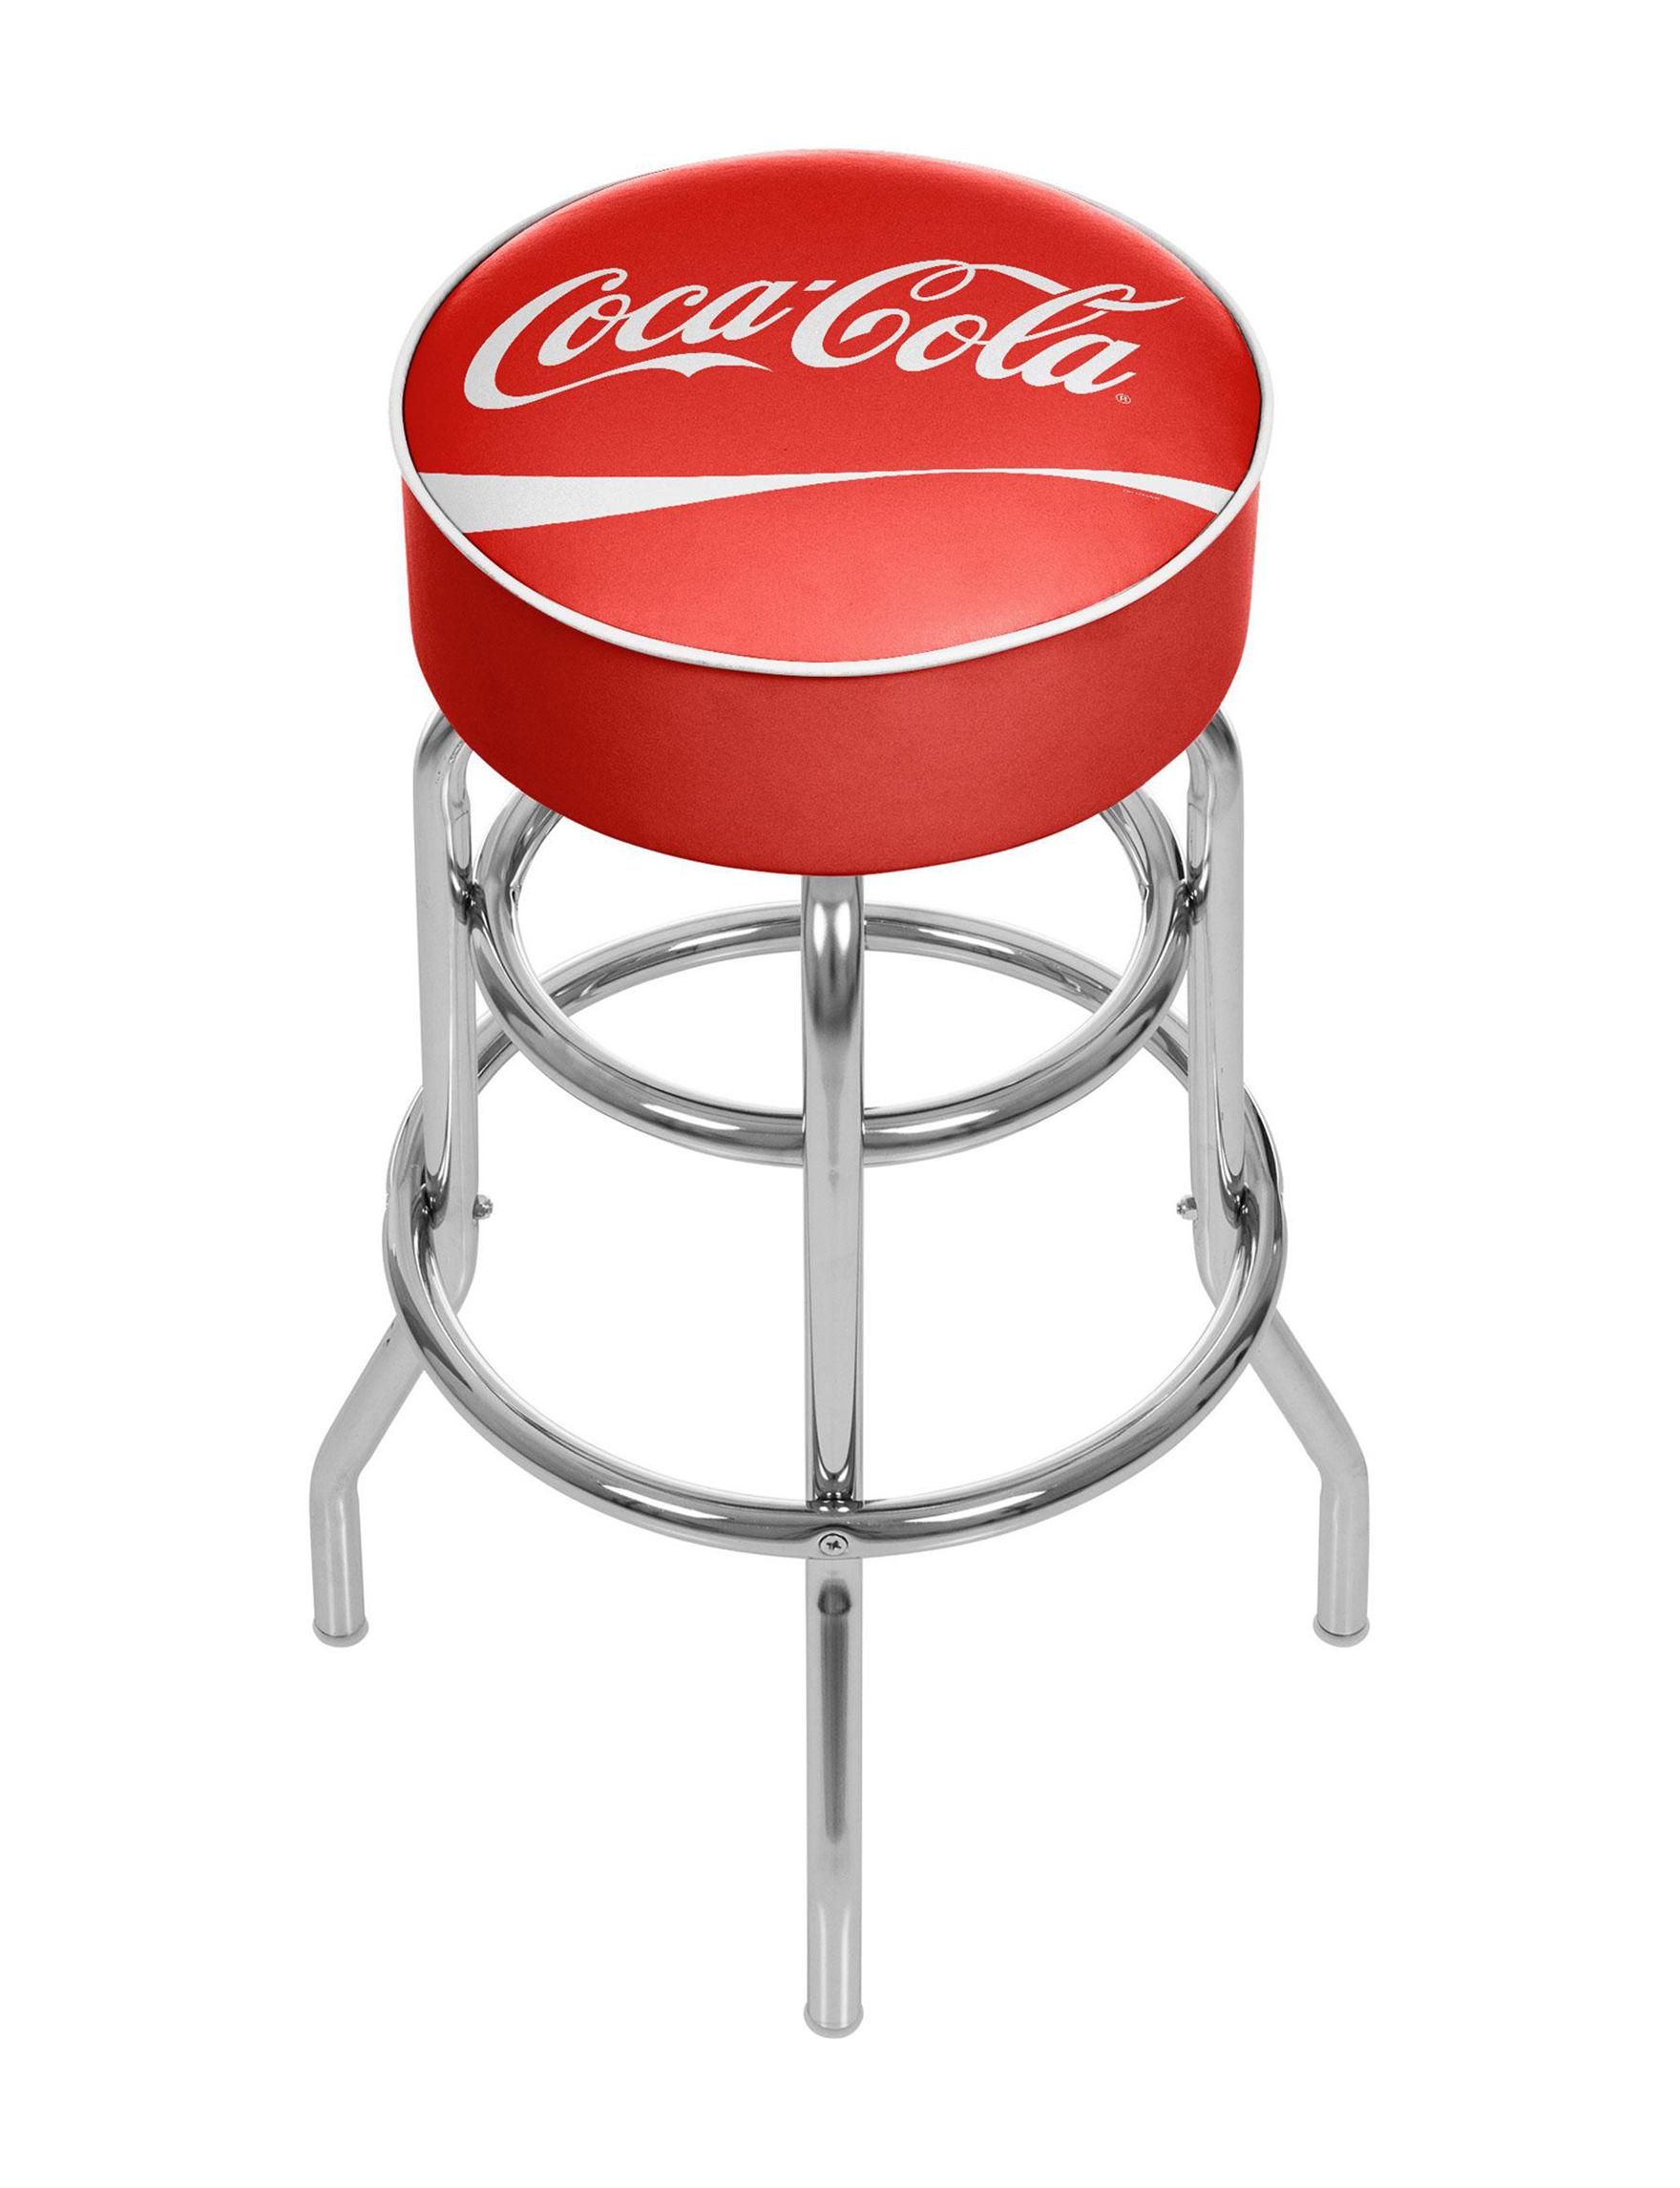 Coca Cola Red / White Bar & Kitchen Stools Kitchen & Dining Furniture